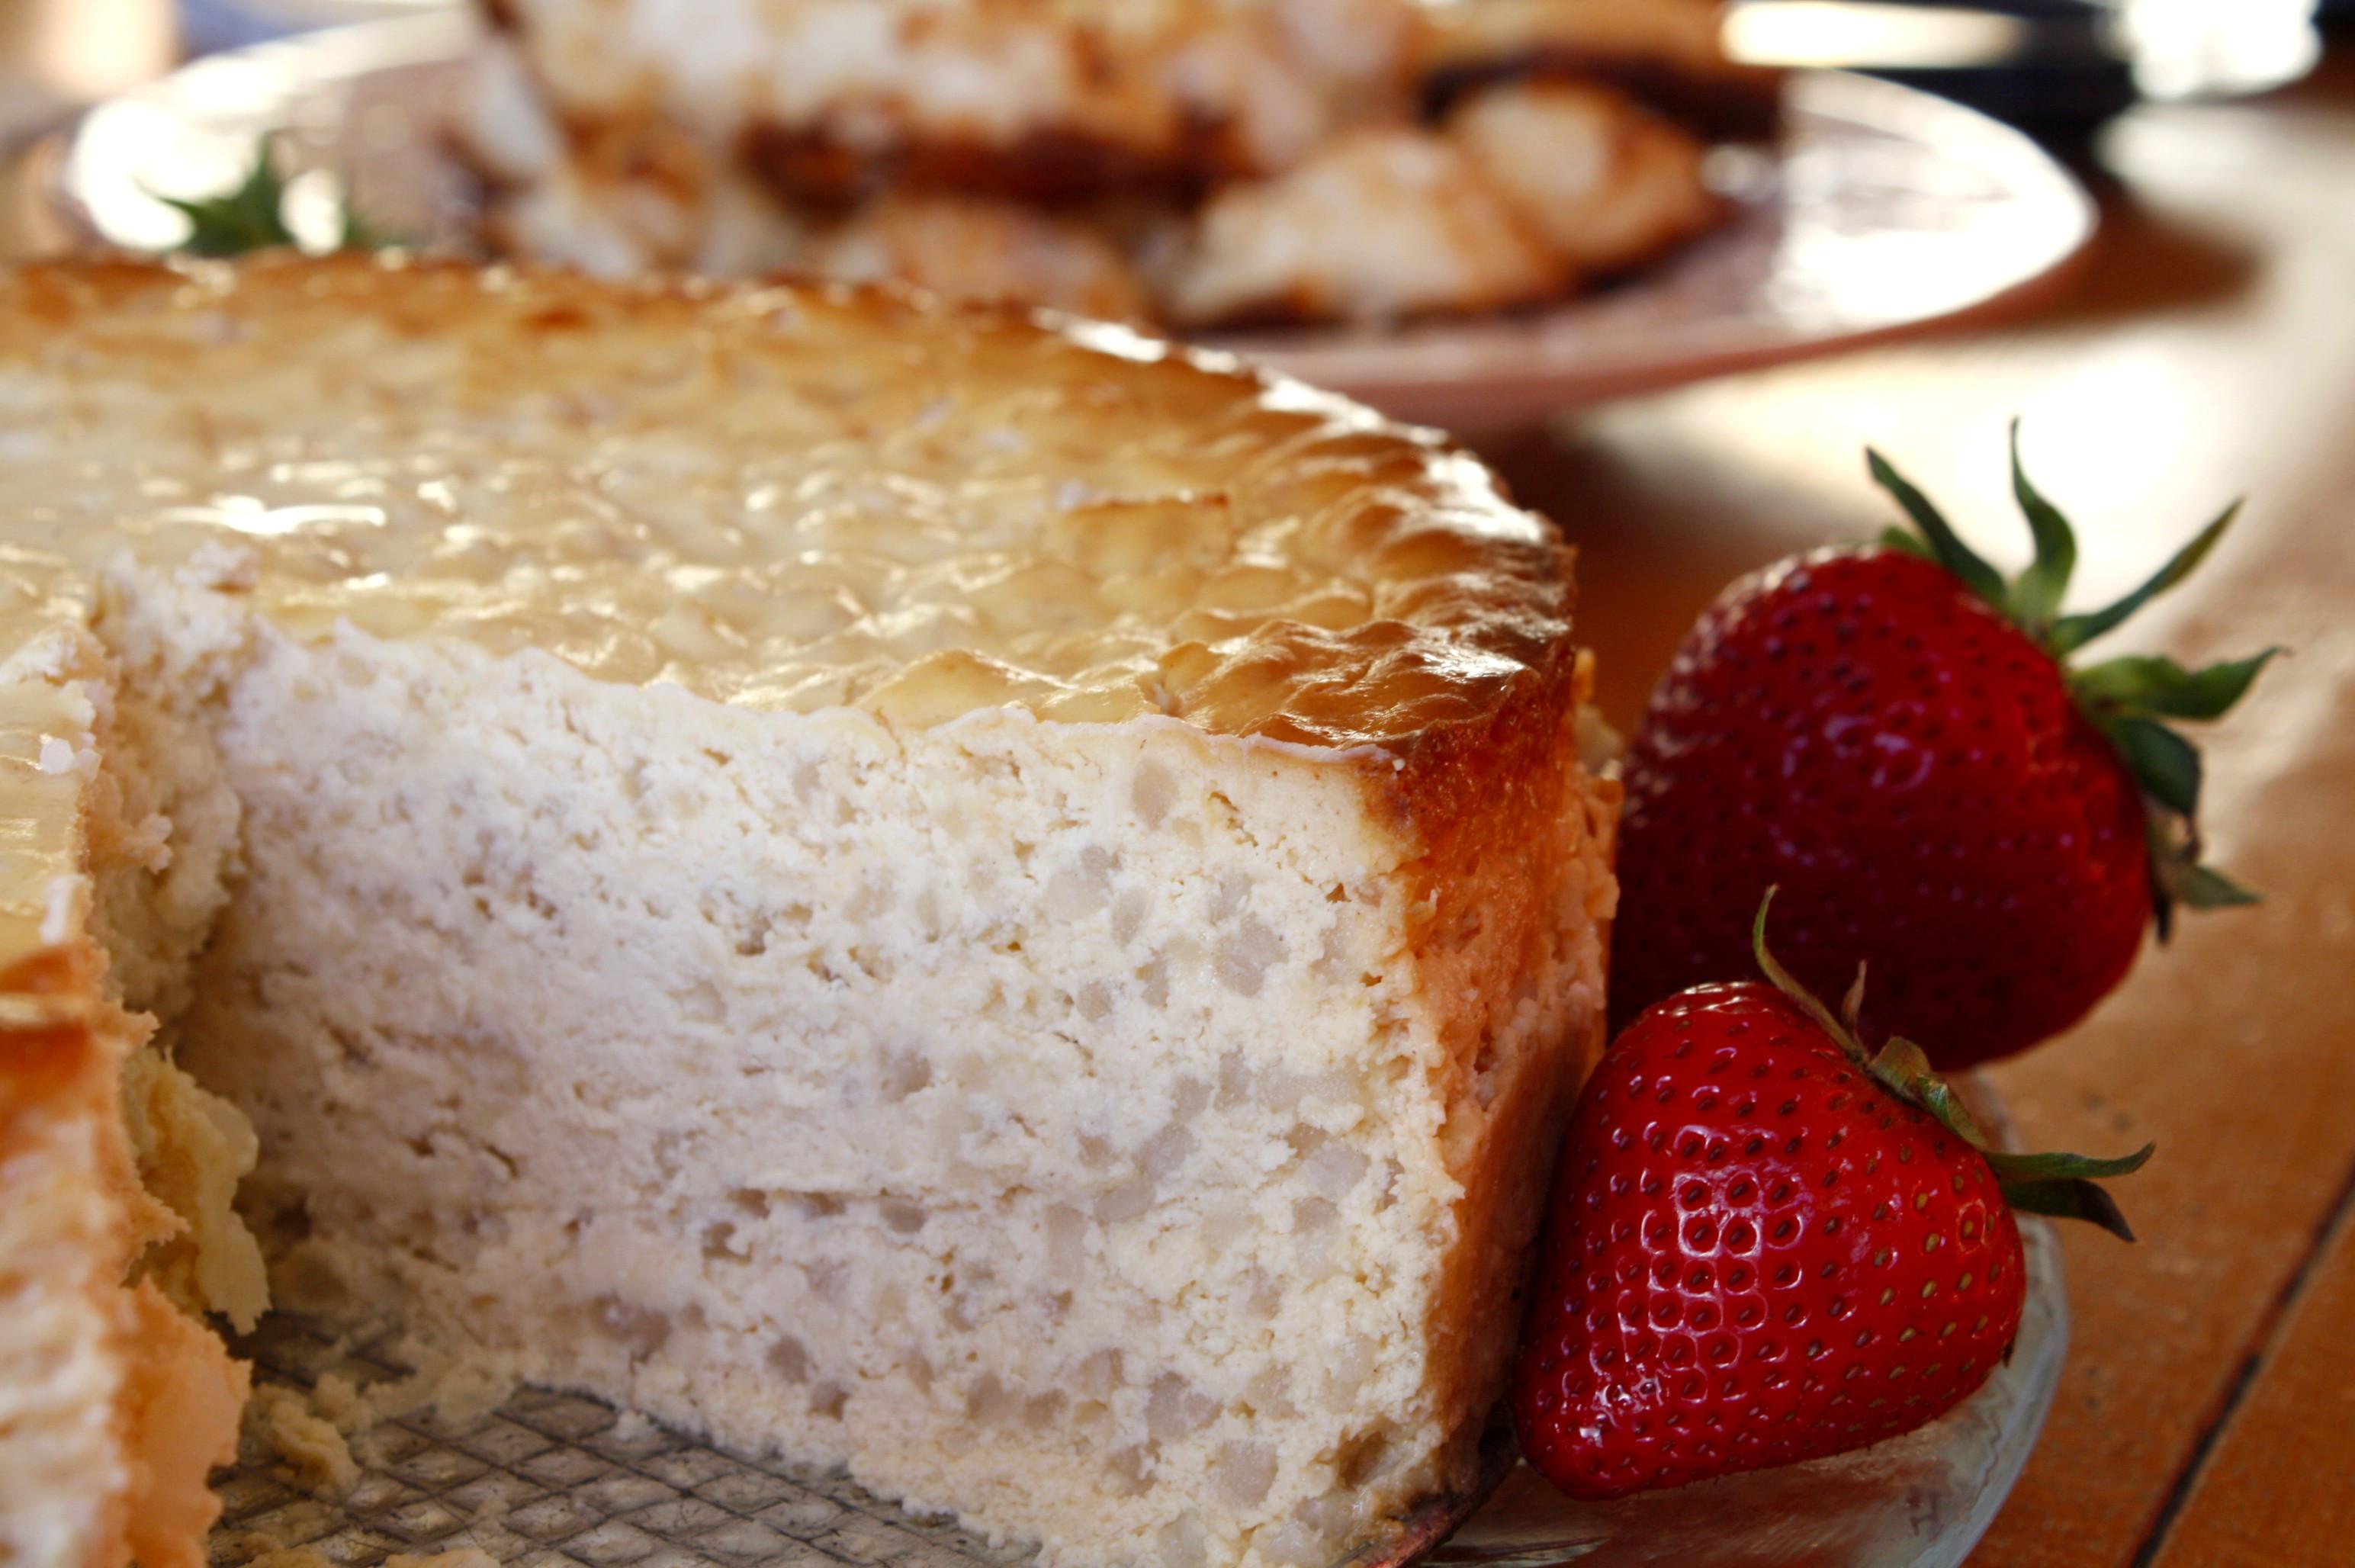 Italian Easter Dessert Recipes  Pastiera Neapolitan Easter Pie Our Italian Table